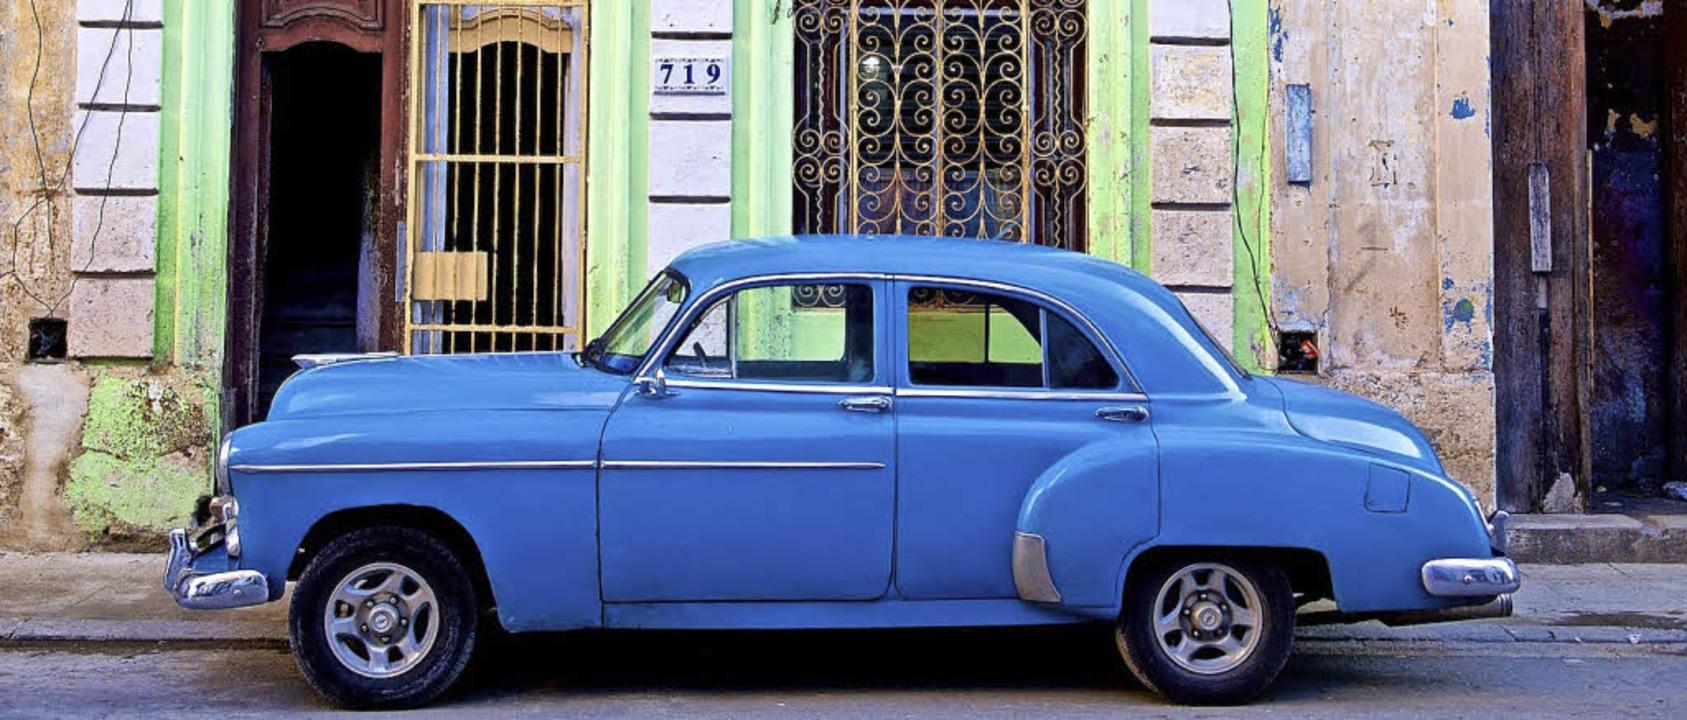 Sinnbildlich für Kuba: farbenfrohe Oldtimer   | Foto: Spag Photography